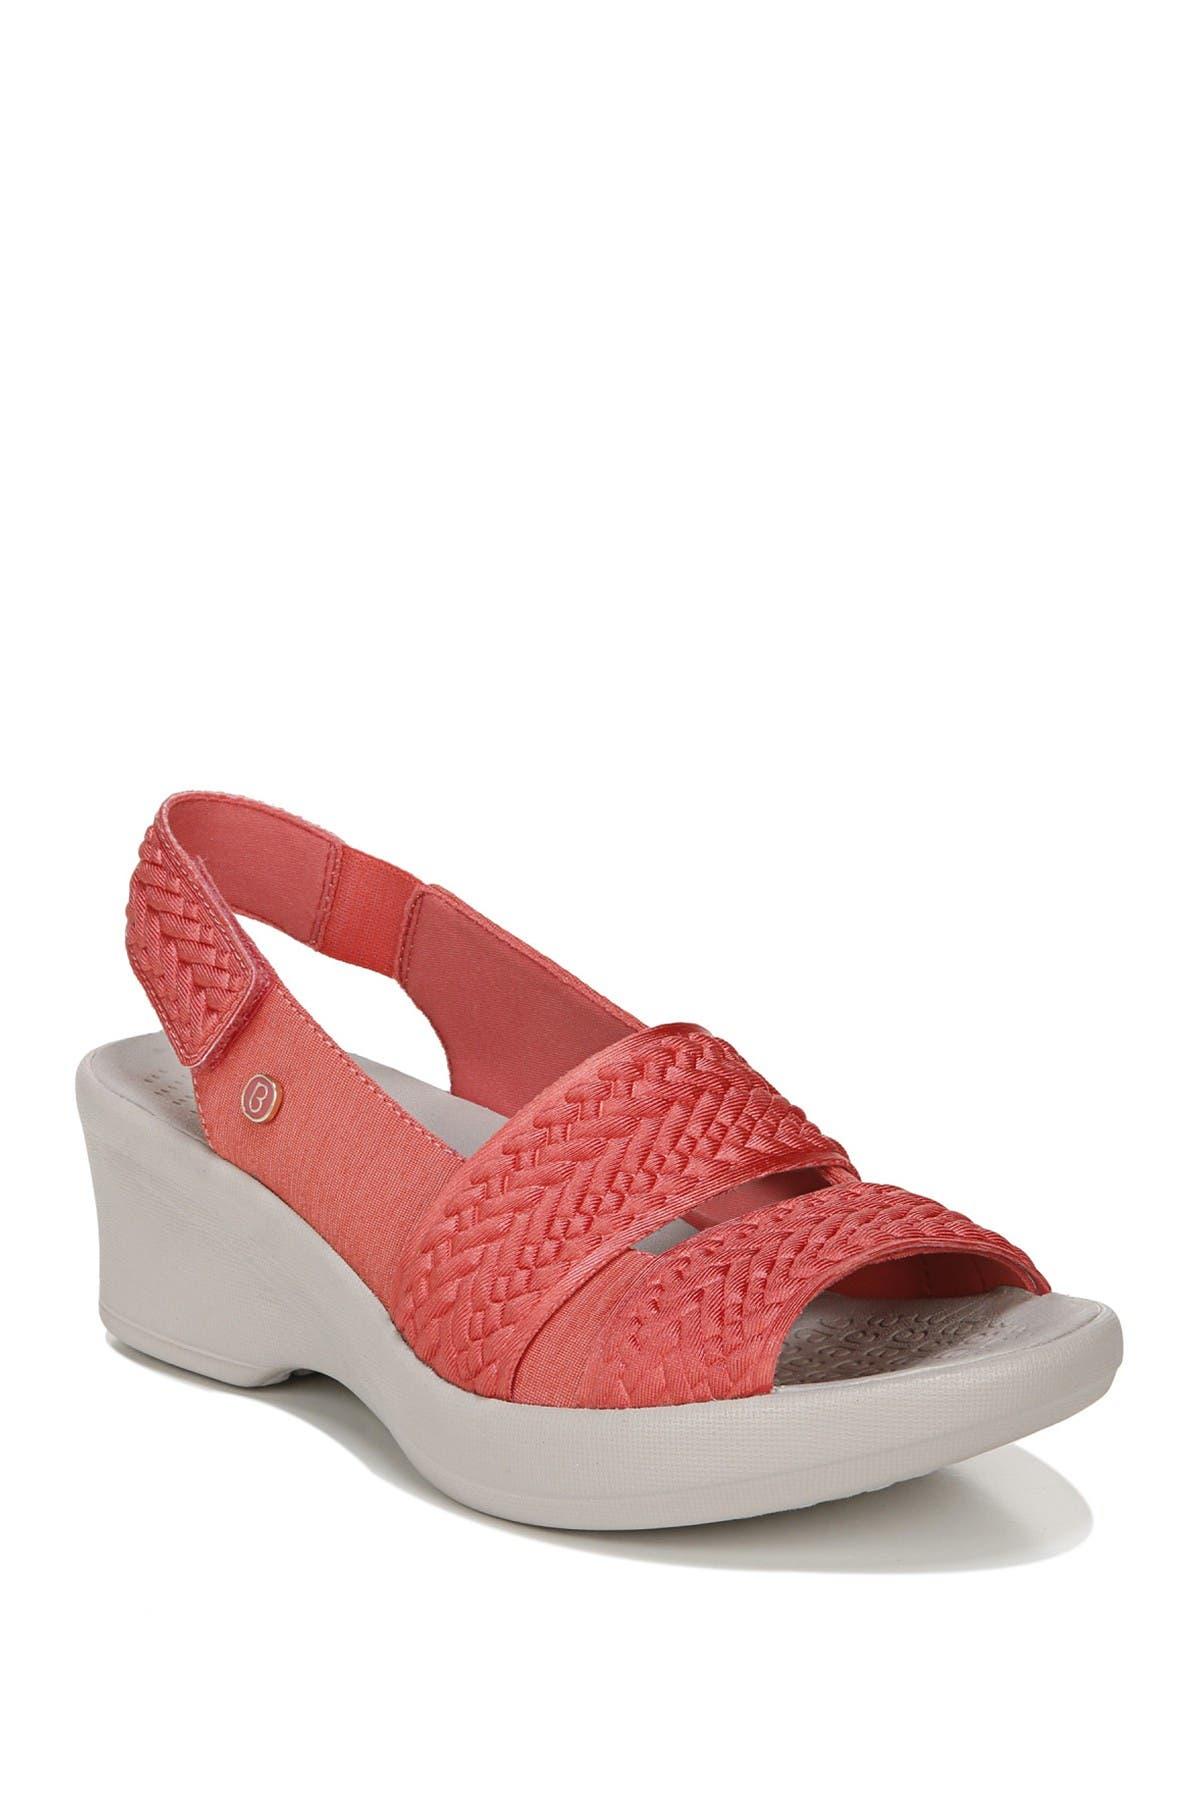 Image of BZEES Fiona Weave Wedge Sandal